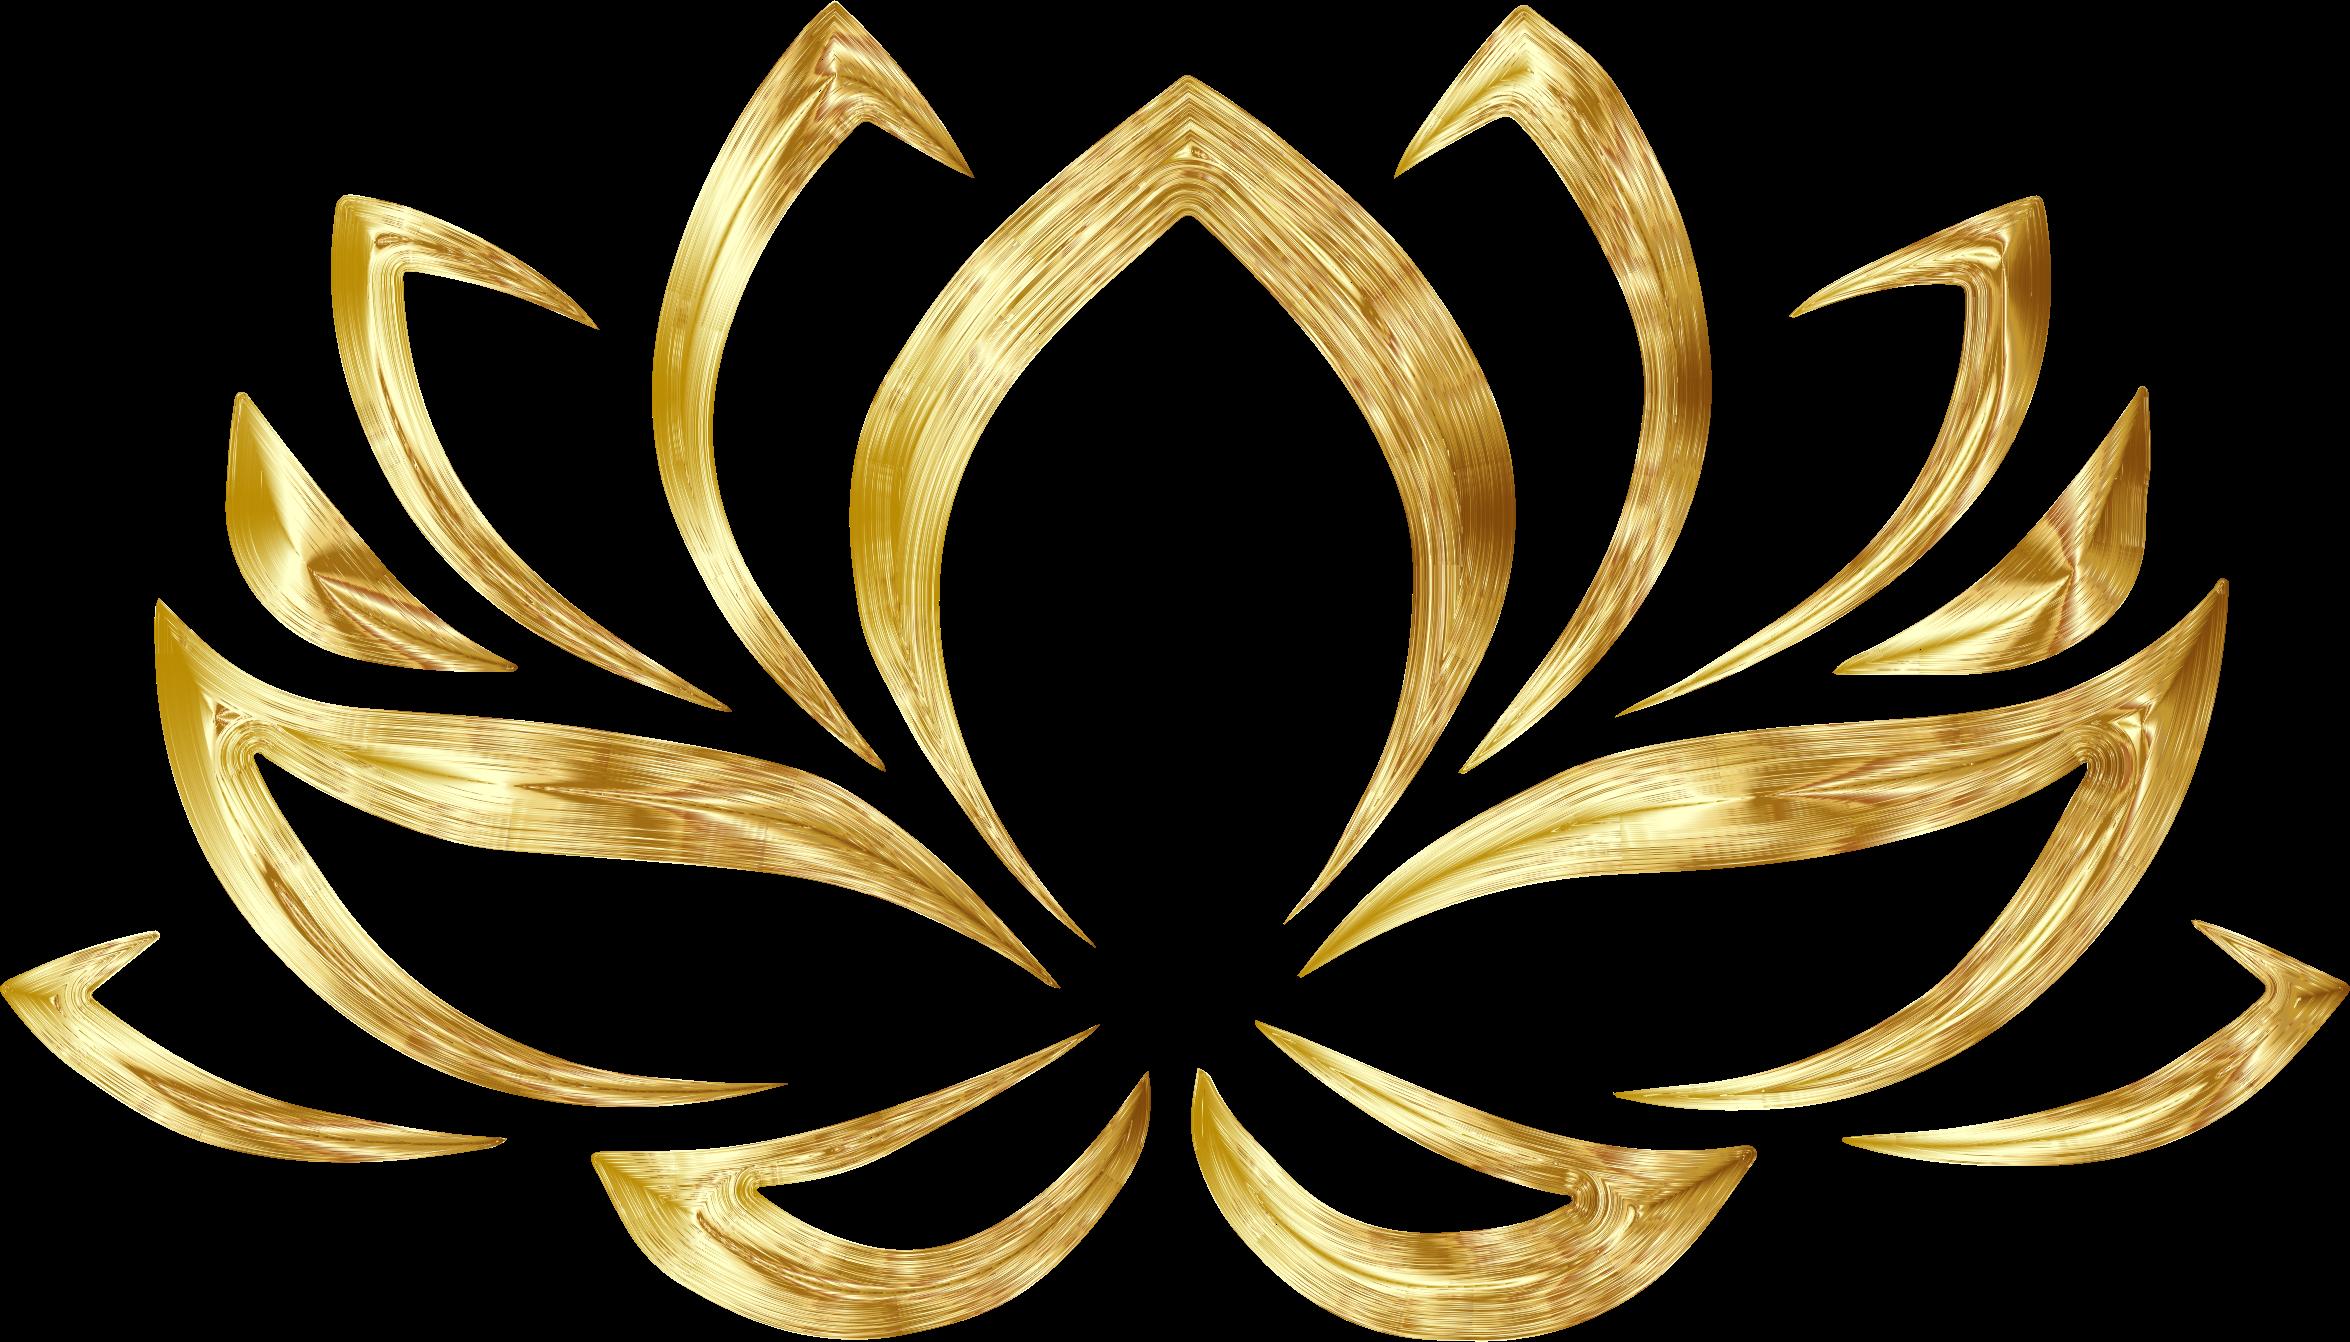 Lotus clipart esthetician, Lotus esthetician Transparent.